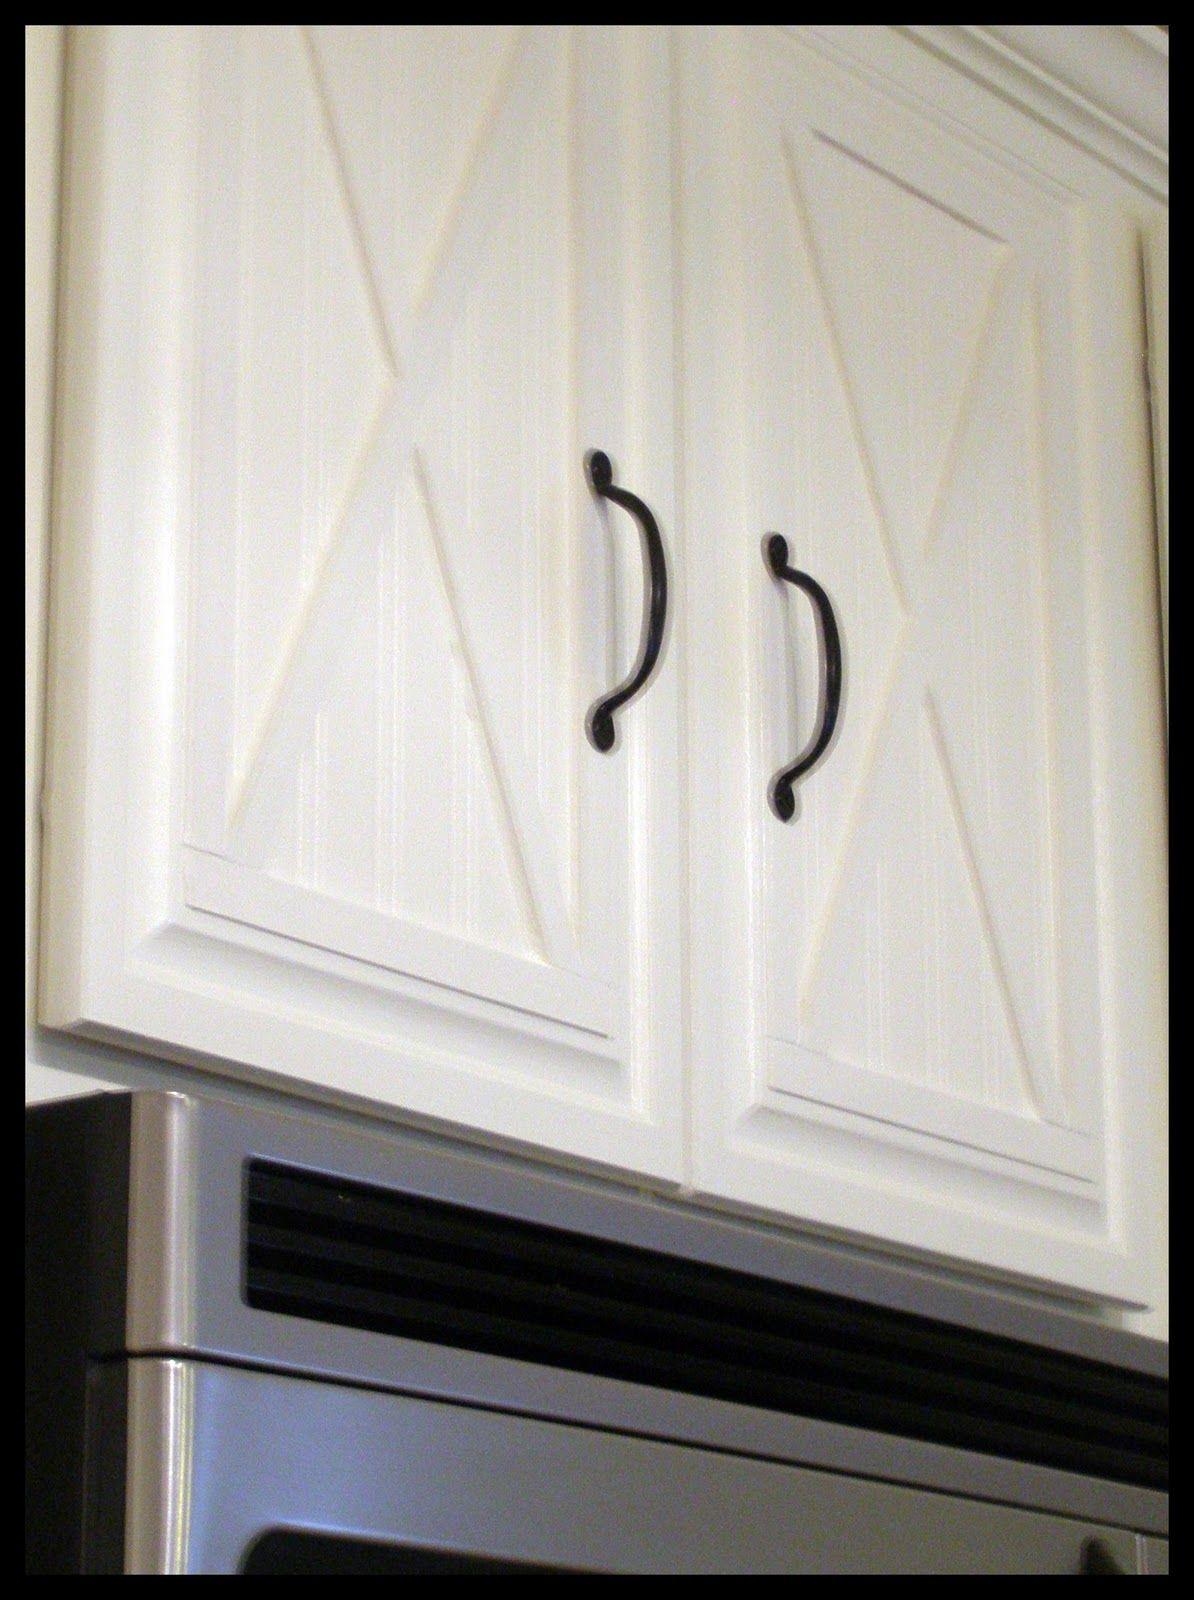 104 Jpg 1194 1600 Beadboard Wallpaper Kitchen Projects Diy Cabinet Doors